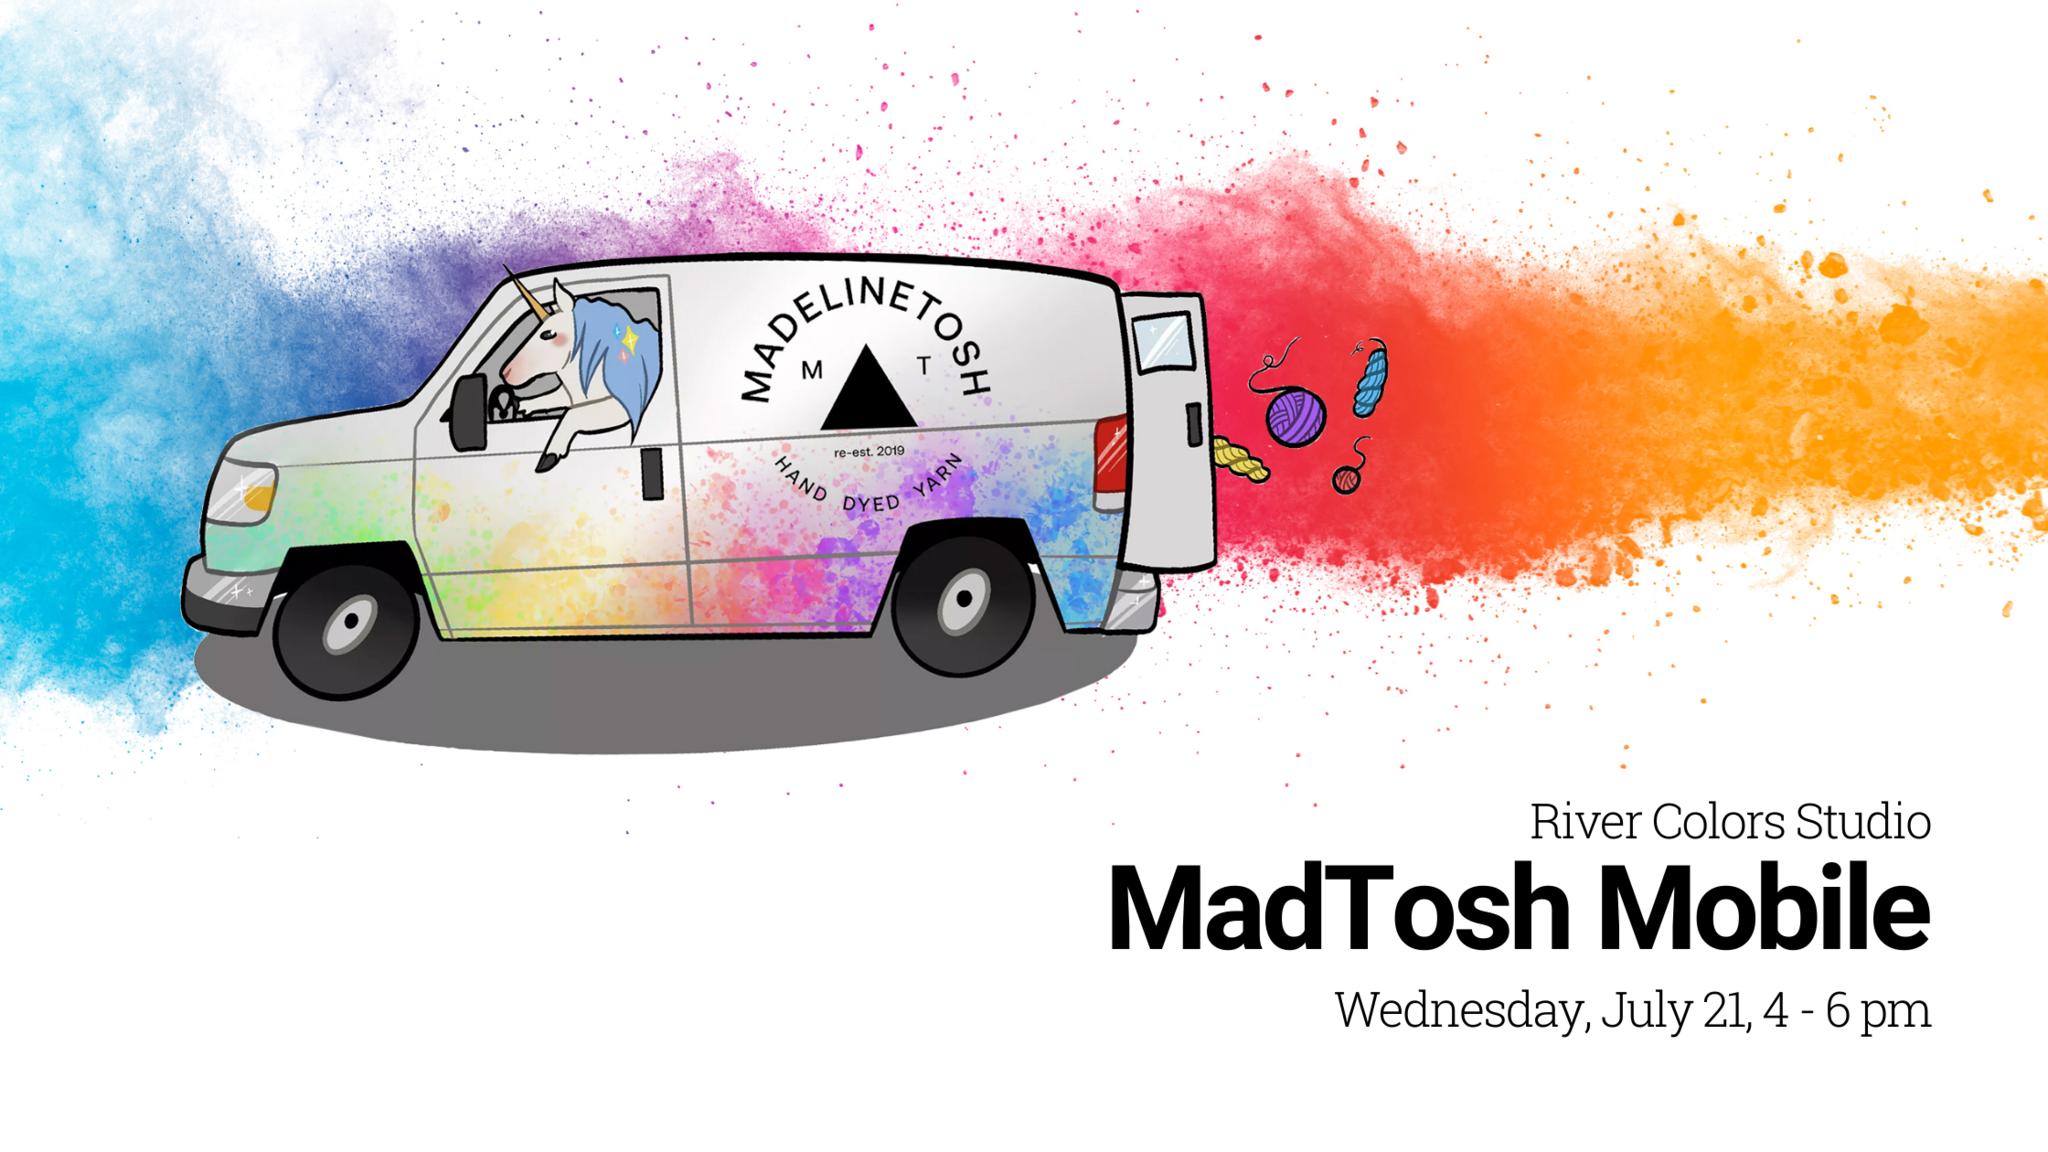 MadTosh Mobile